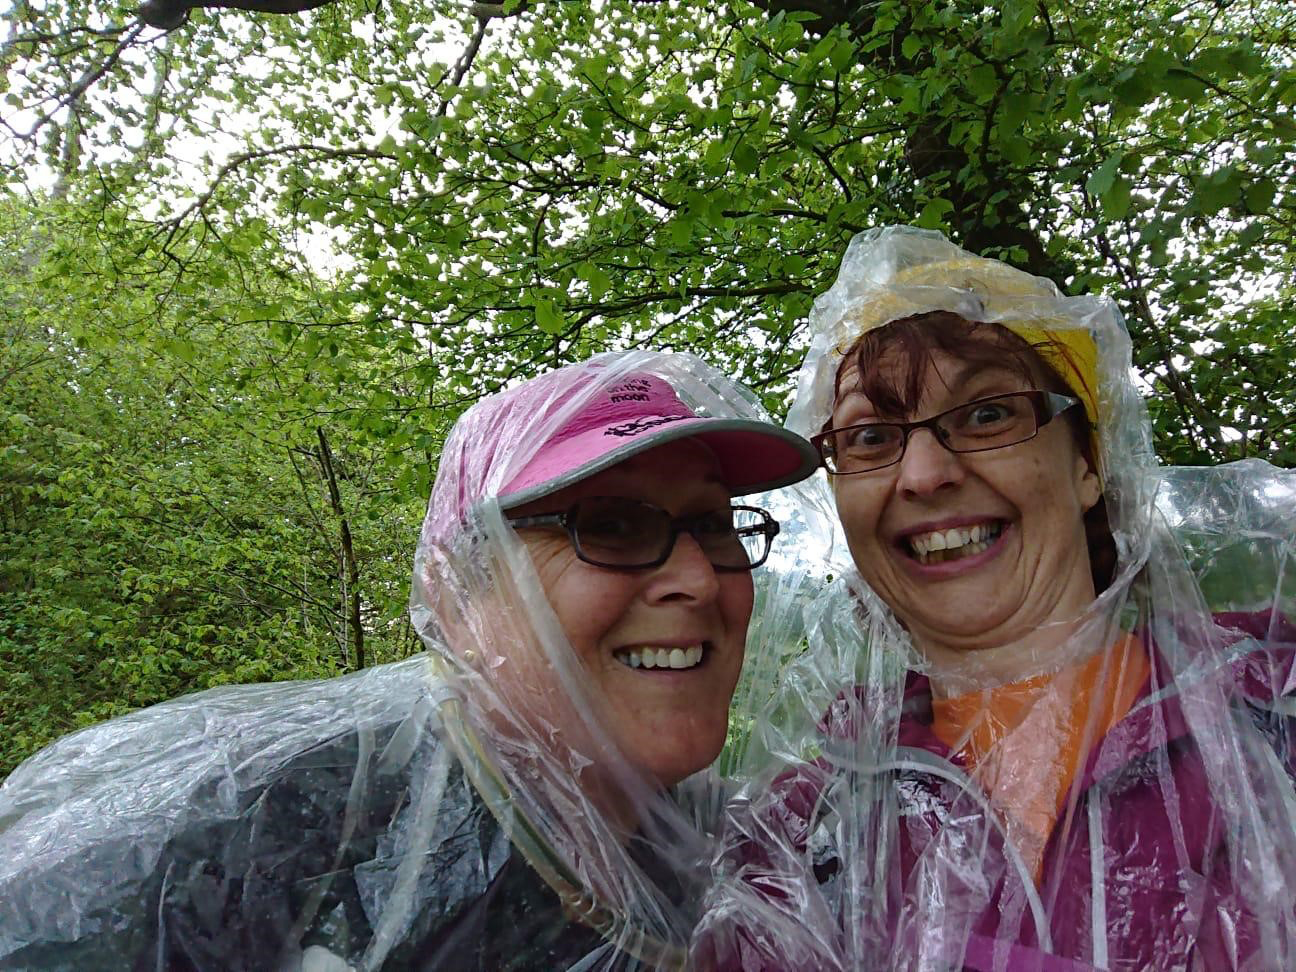 Jane and Julie share a selfie